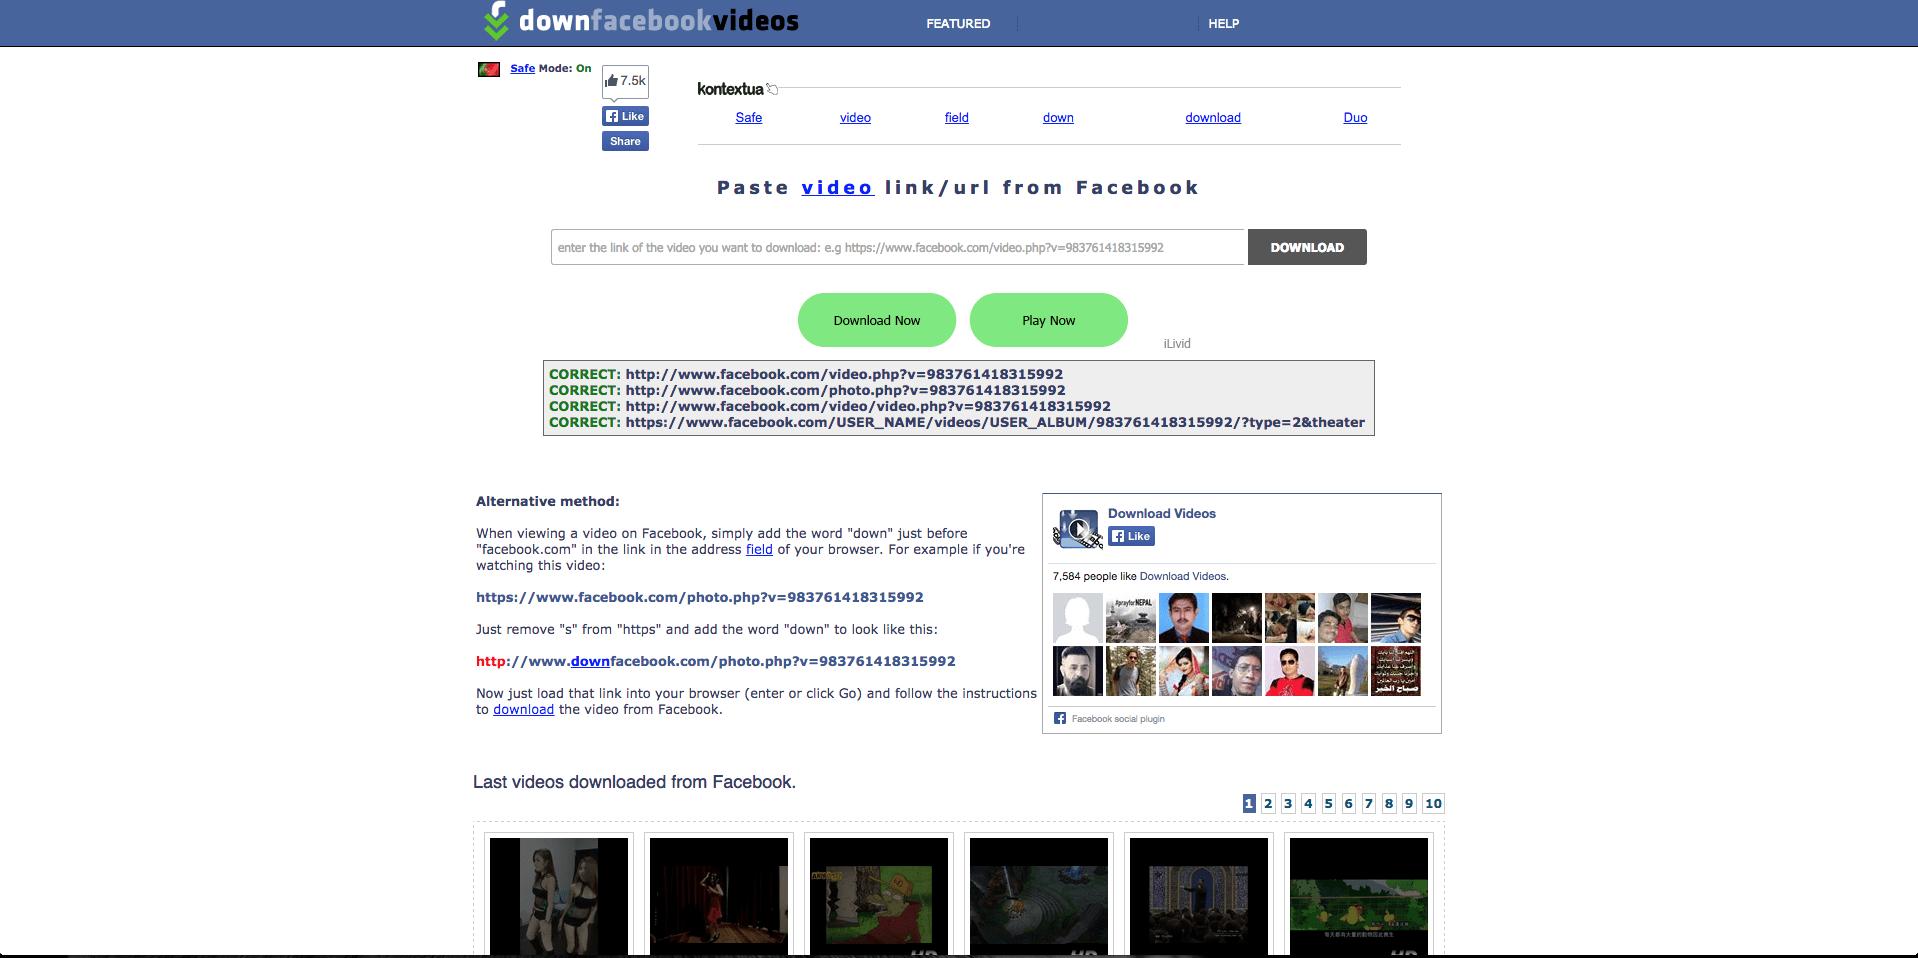 DownFacebook download Facebook videos